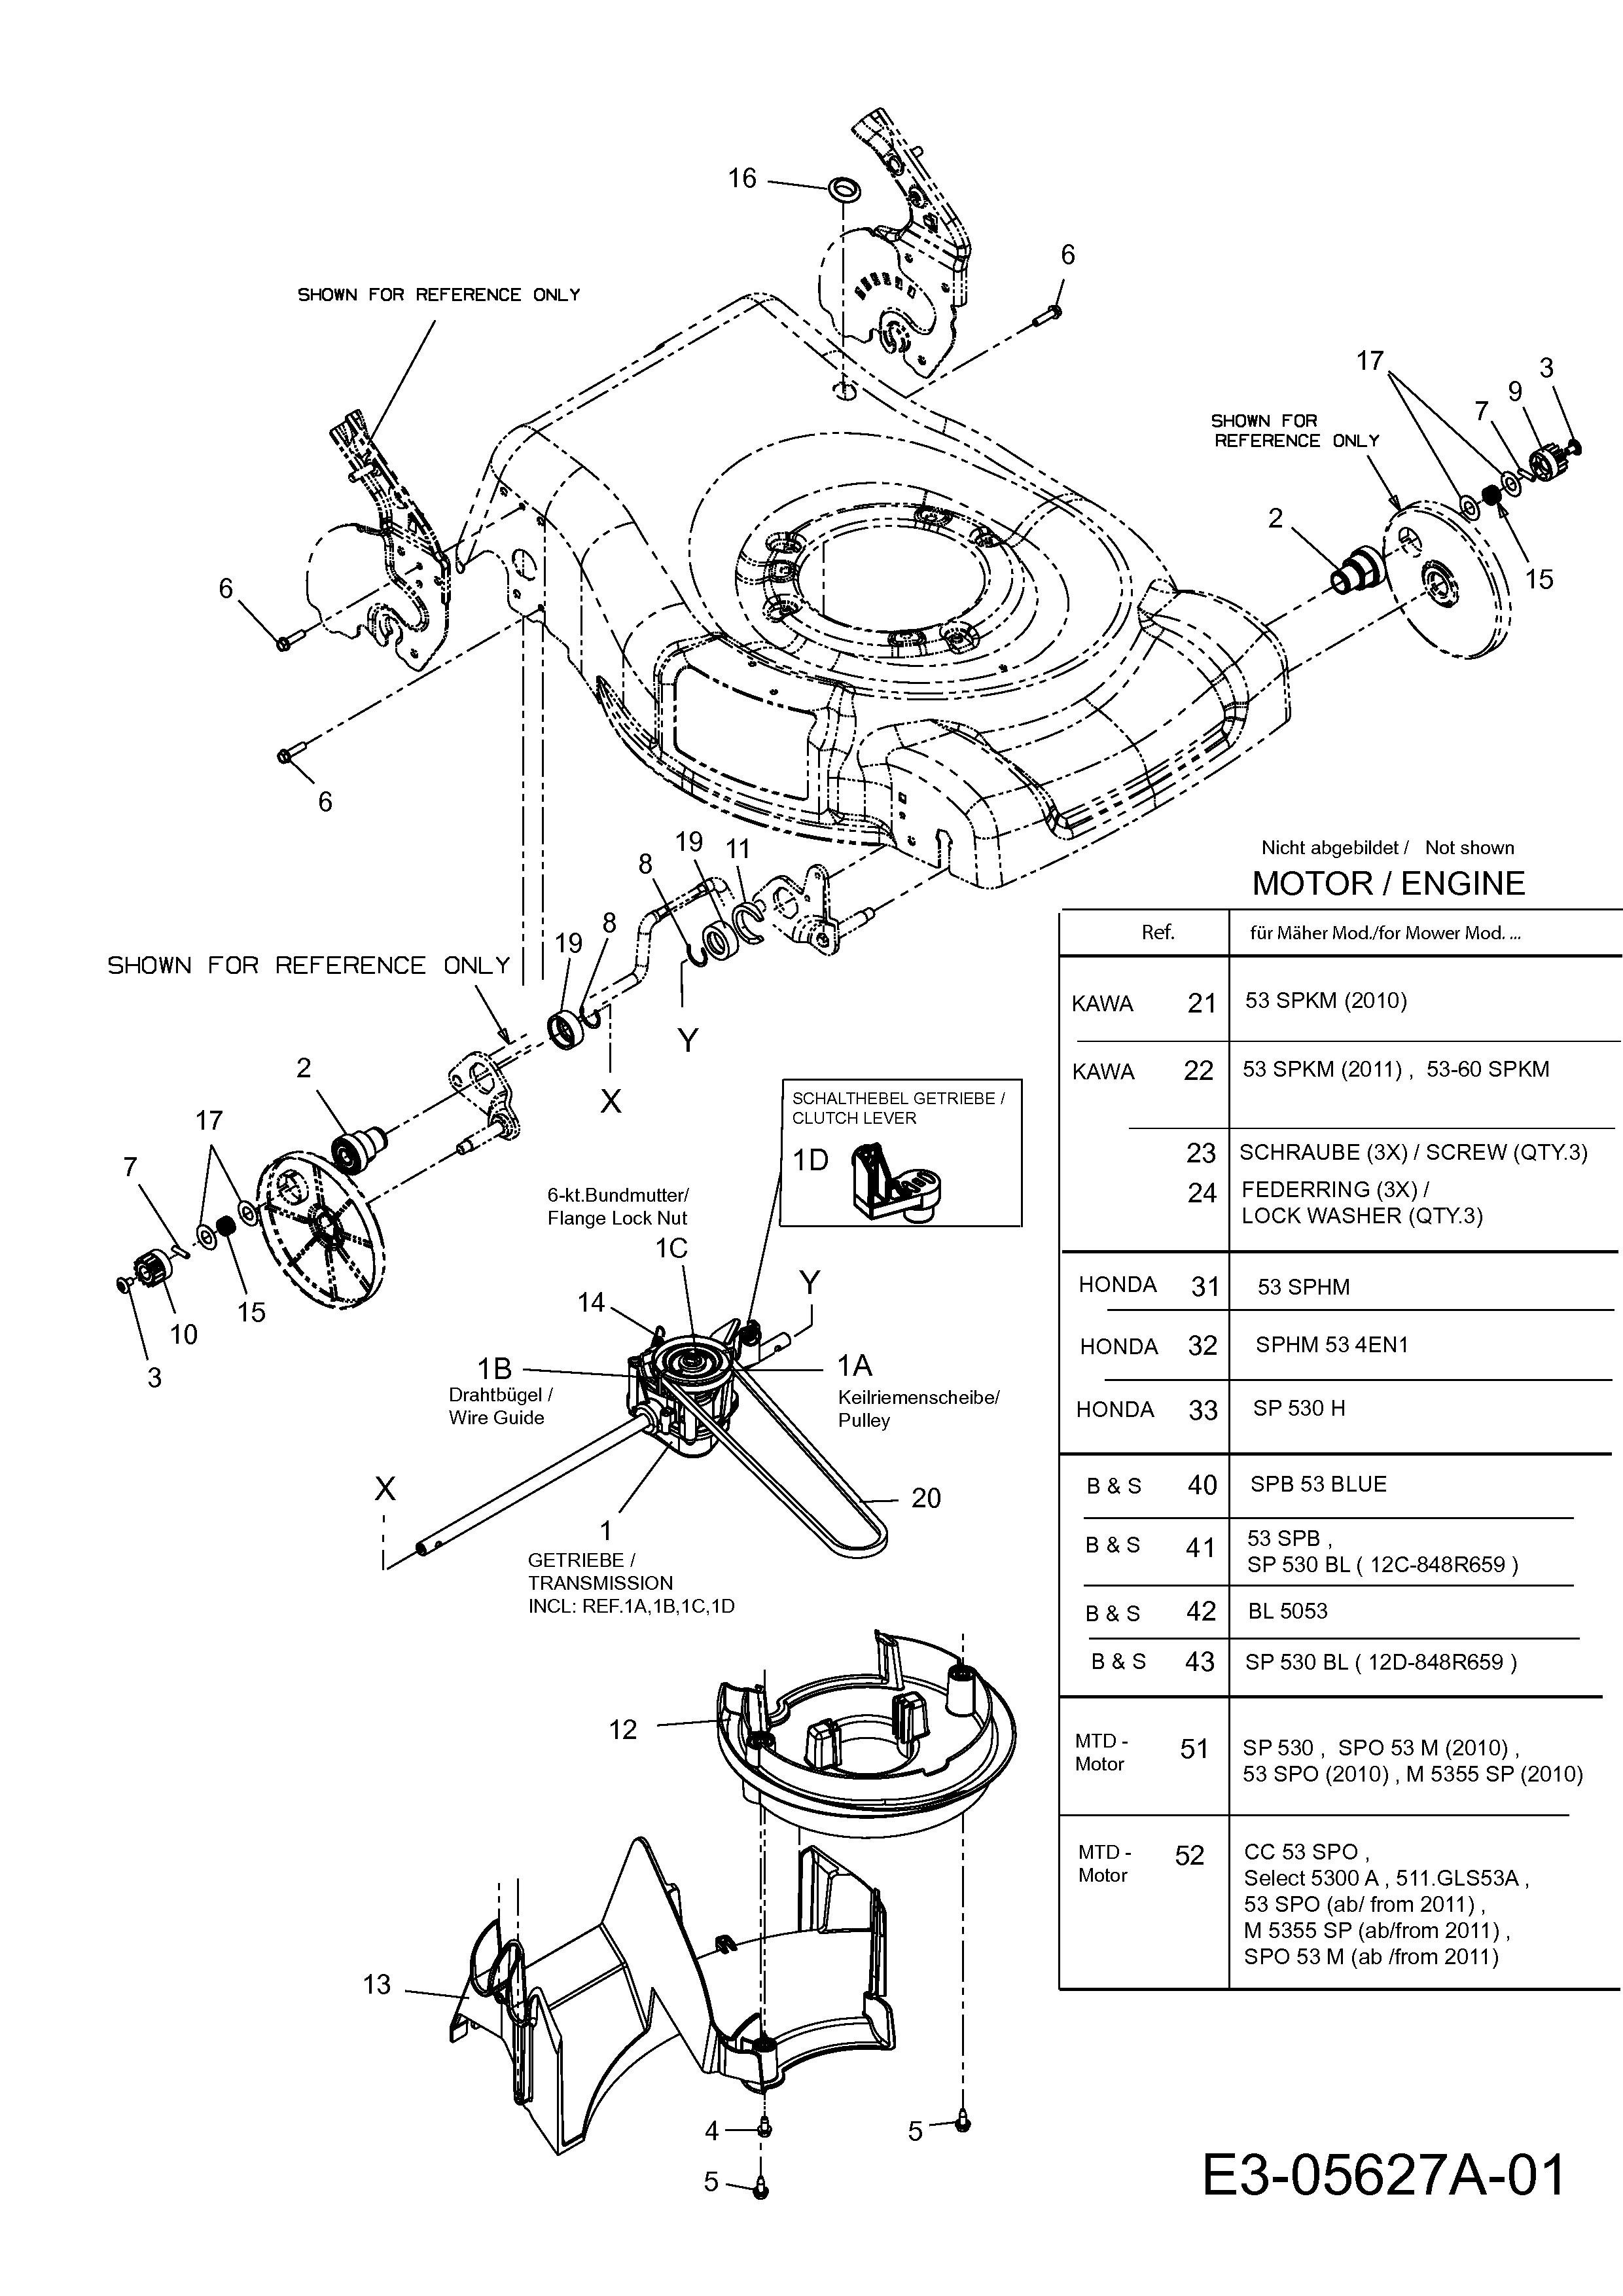 Getriebe, Motor, 12C-844H683 (2013), BL 5053, Motormäher